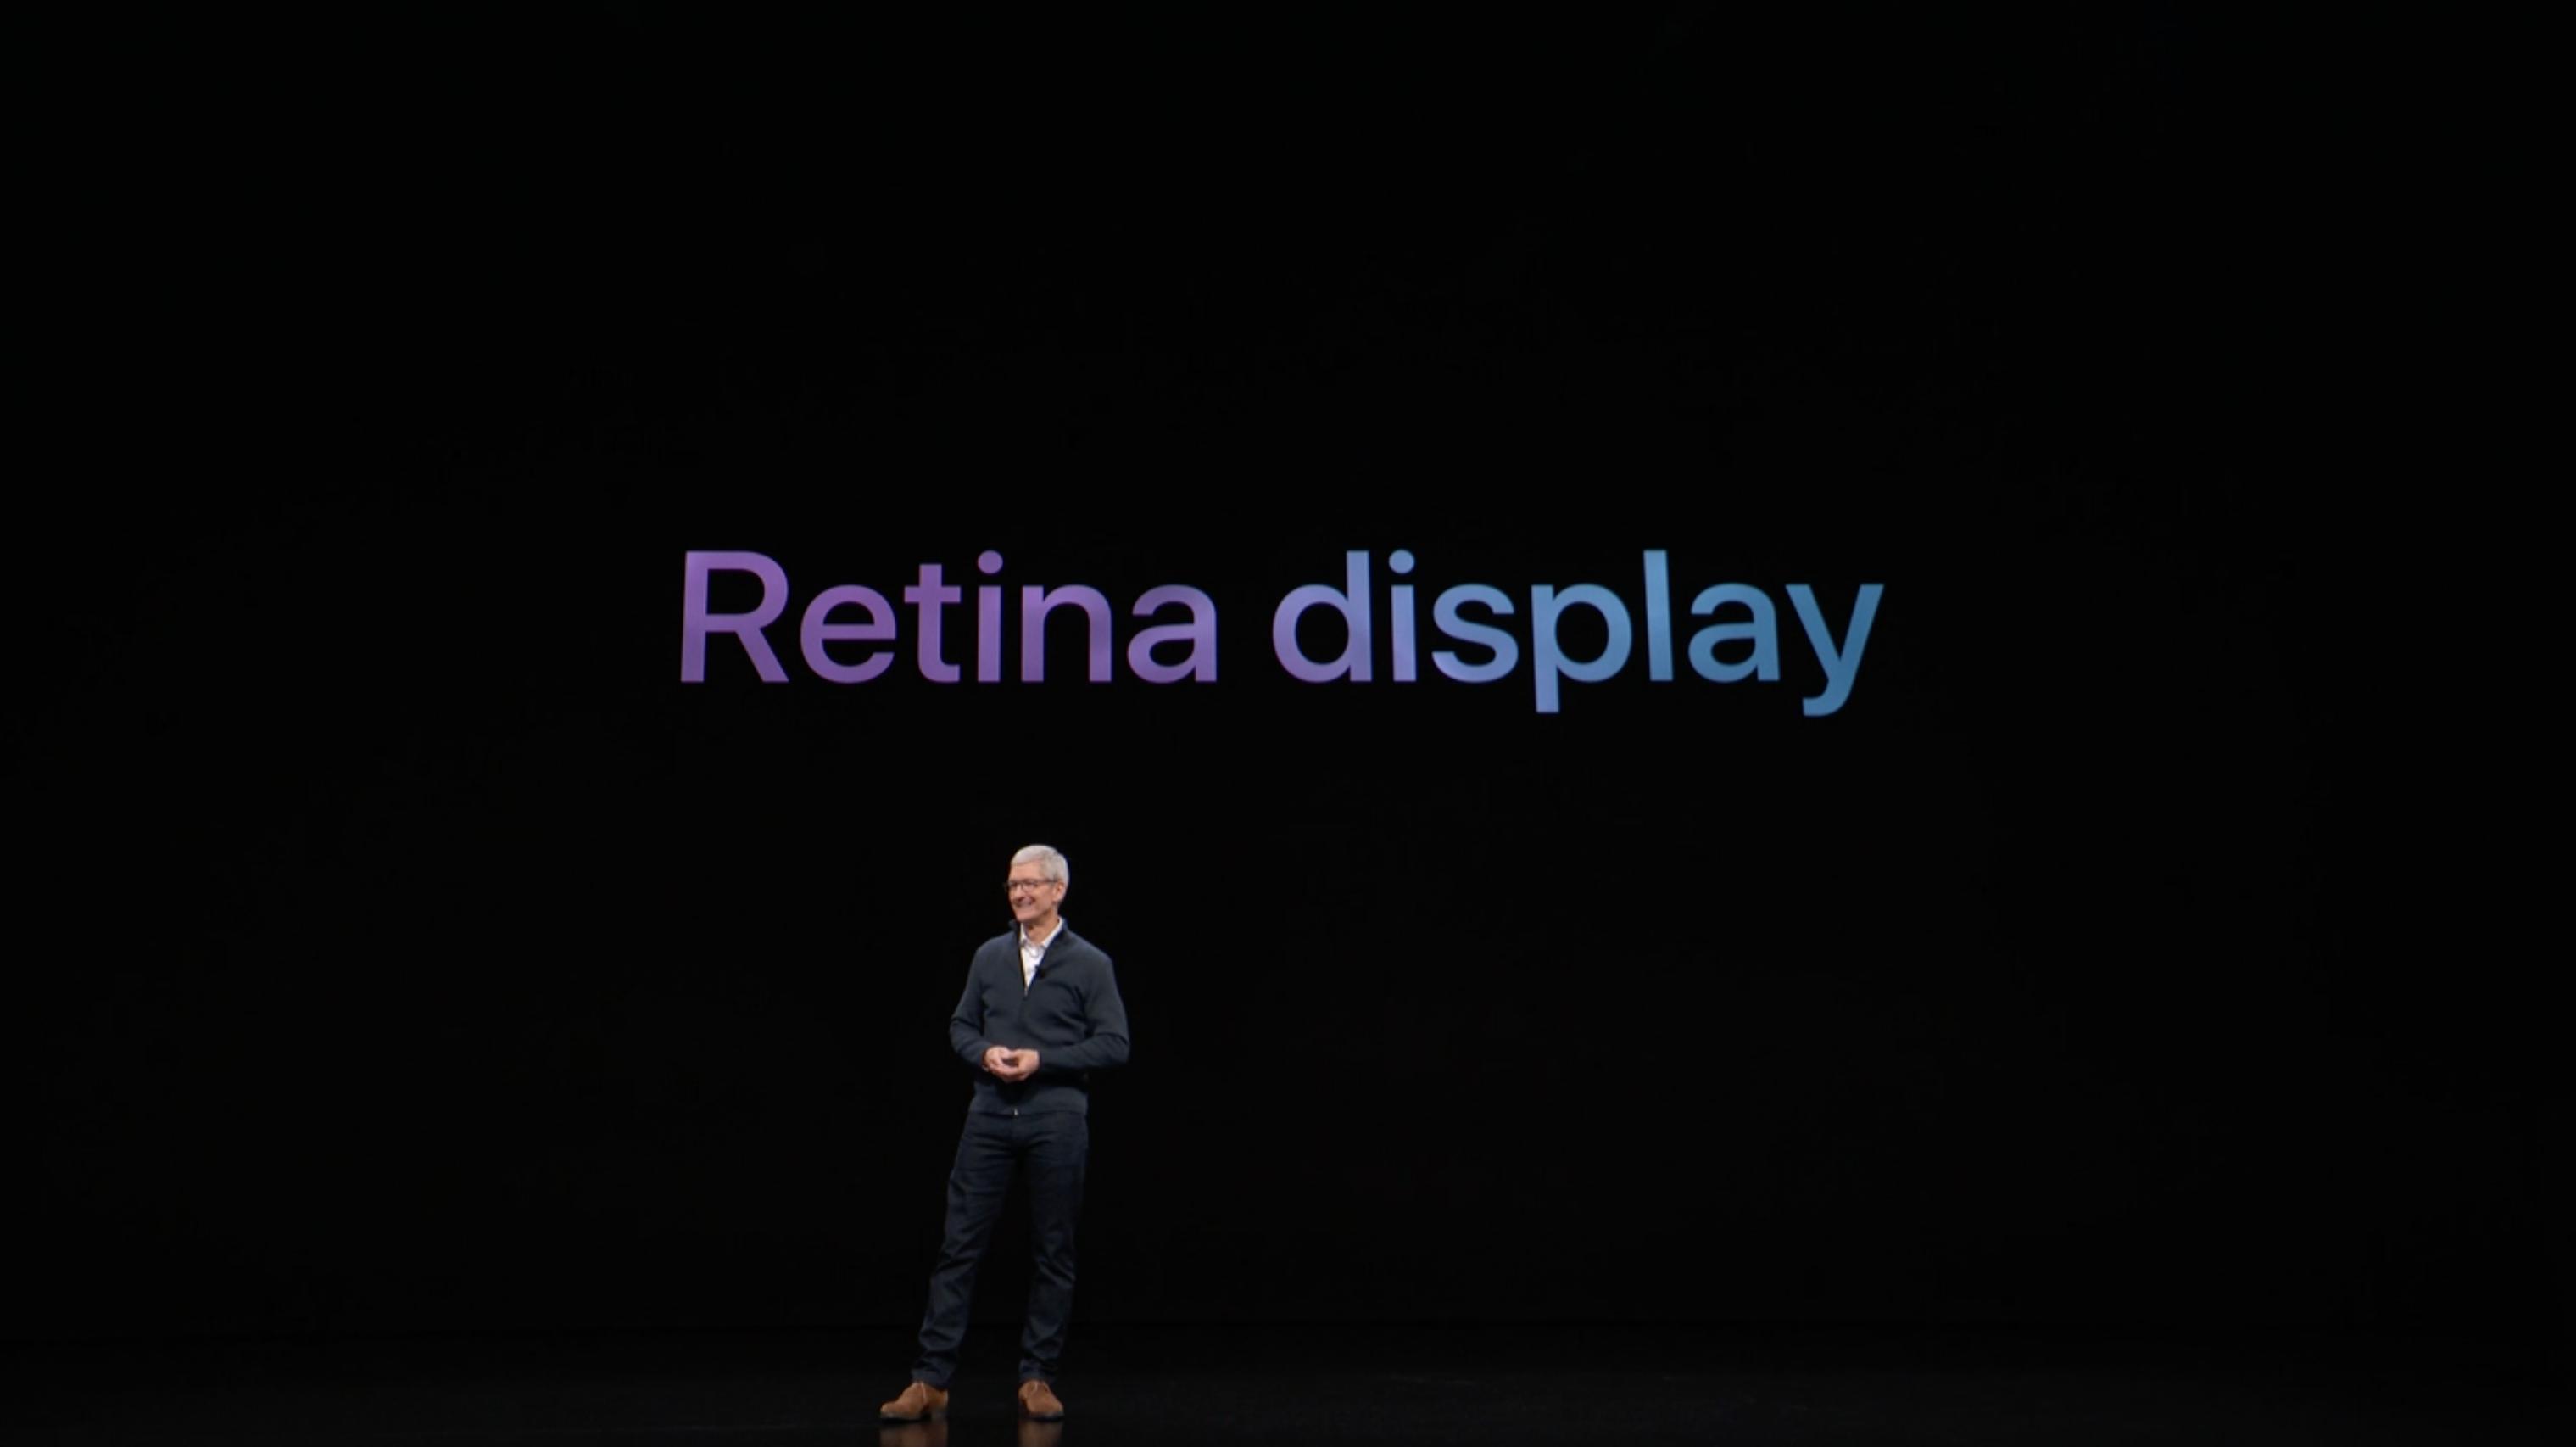 Retina MacBook Air compares